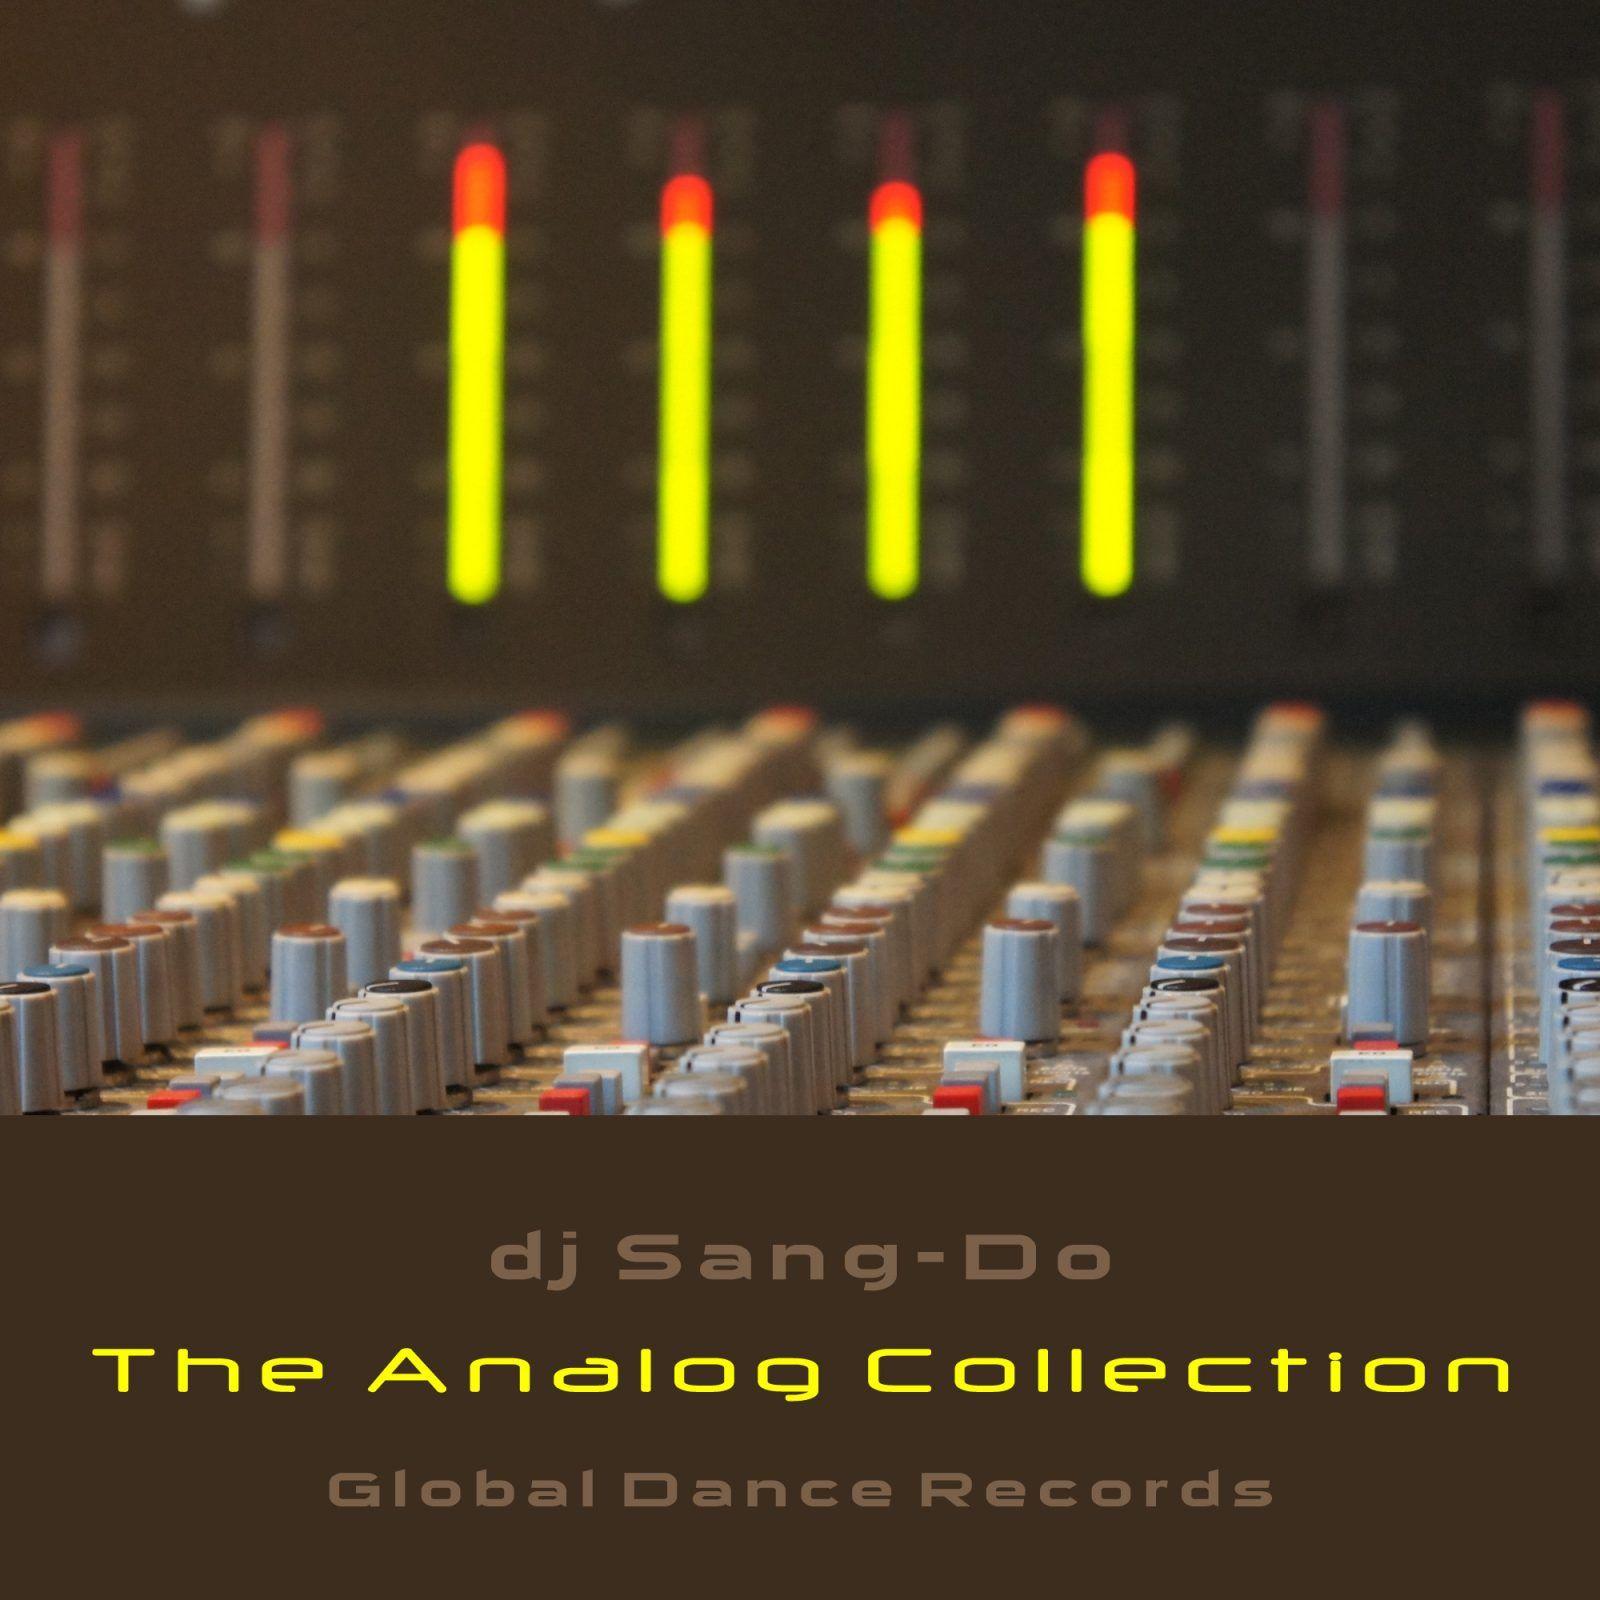 djsang-do-theanalogcollection.jpg